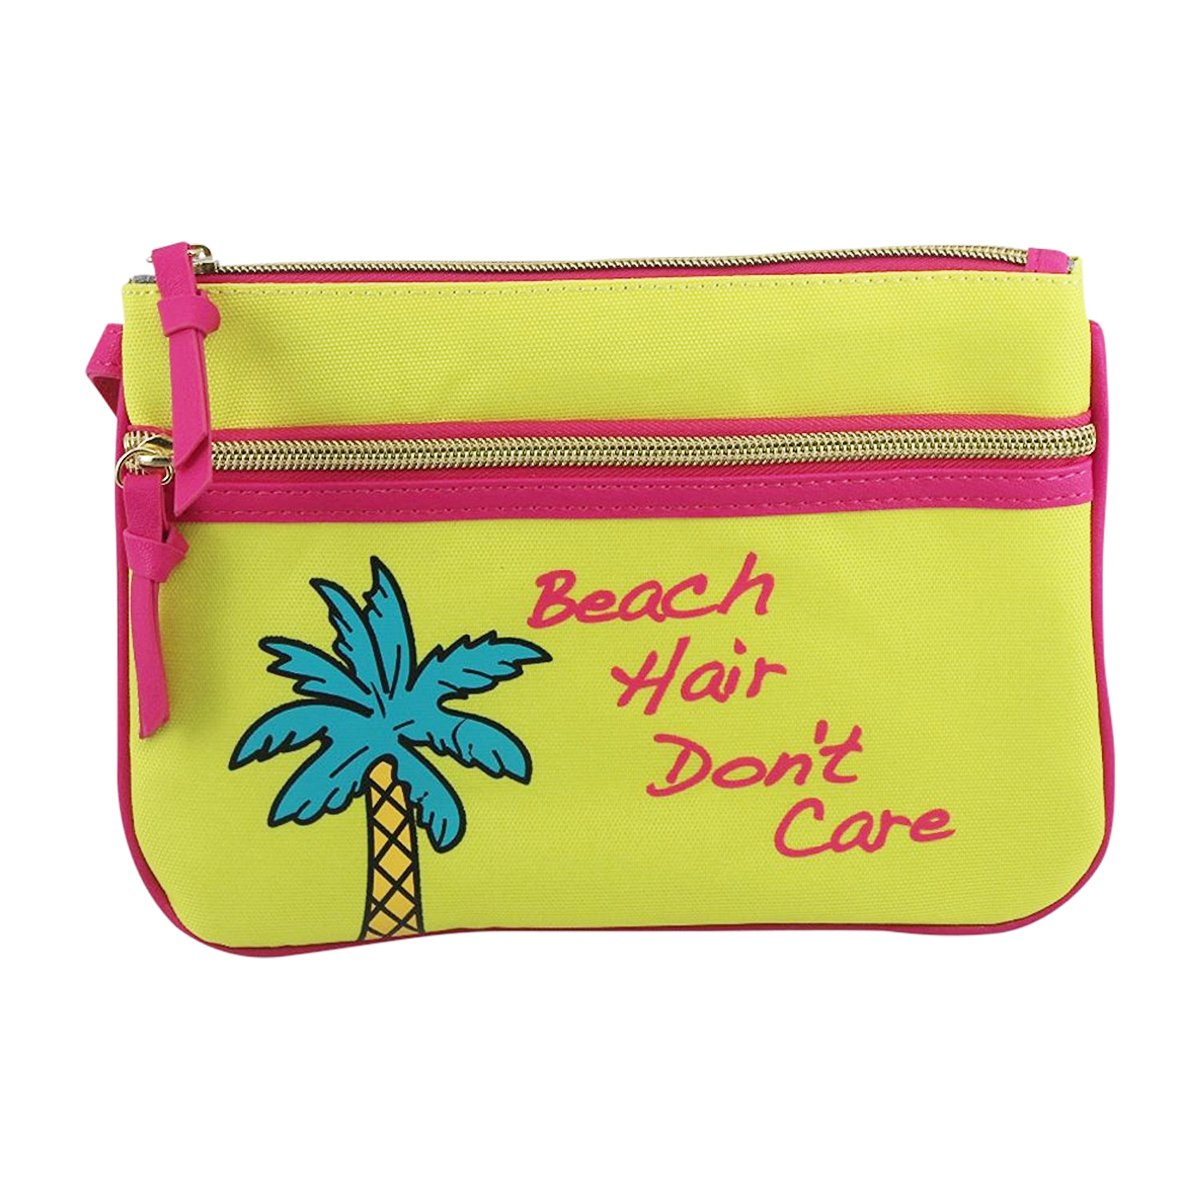 Betsey Johnson Beach Wristlet - Beach Hair Don't Care